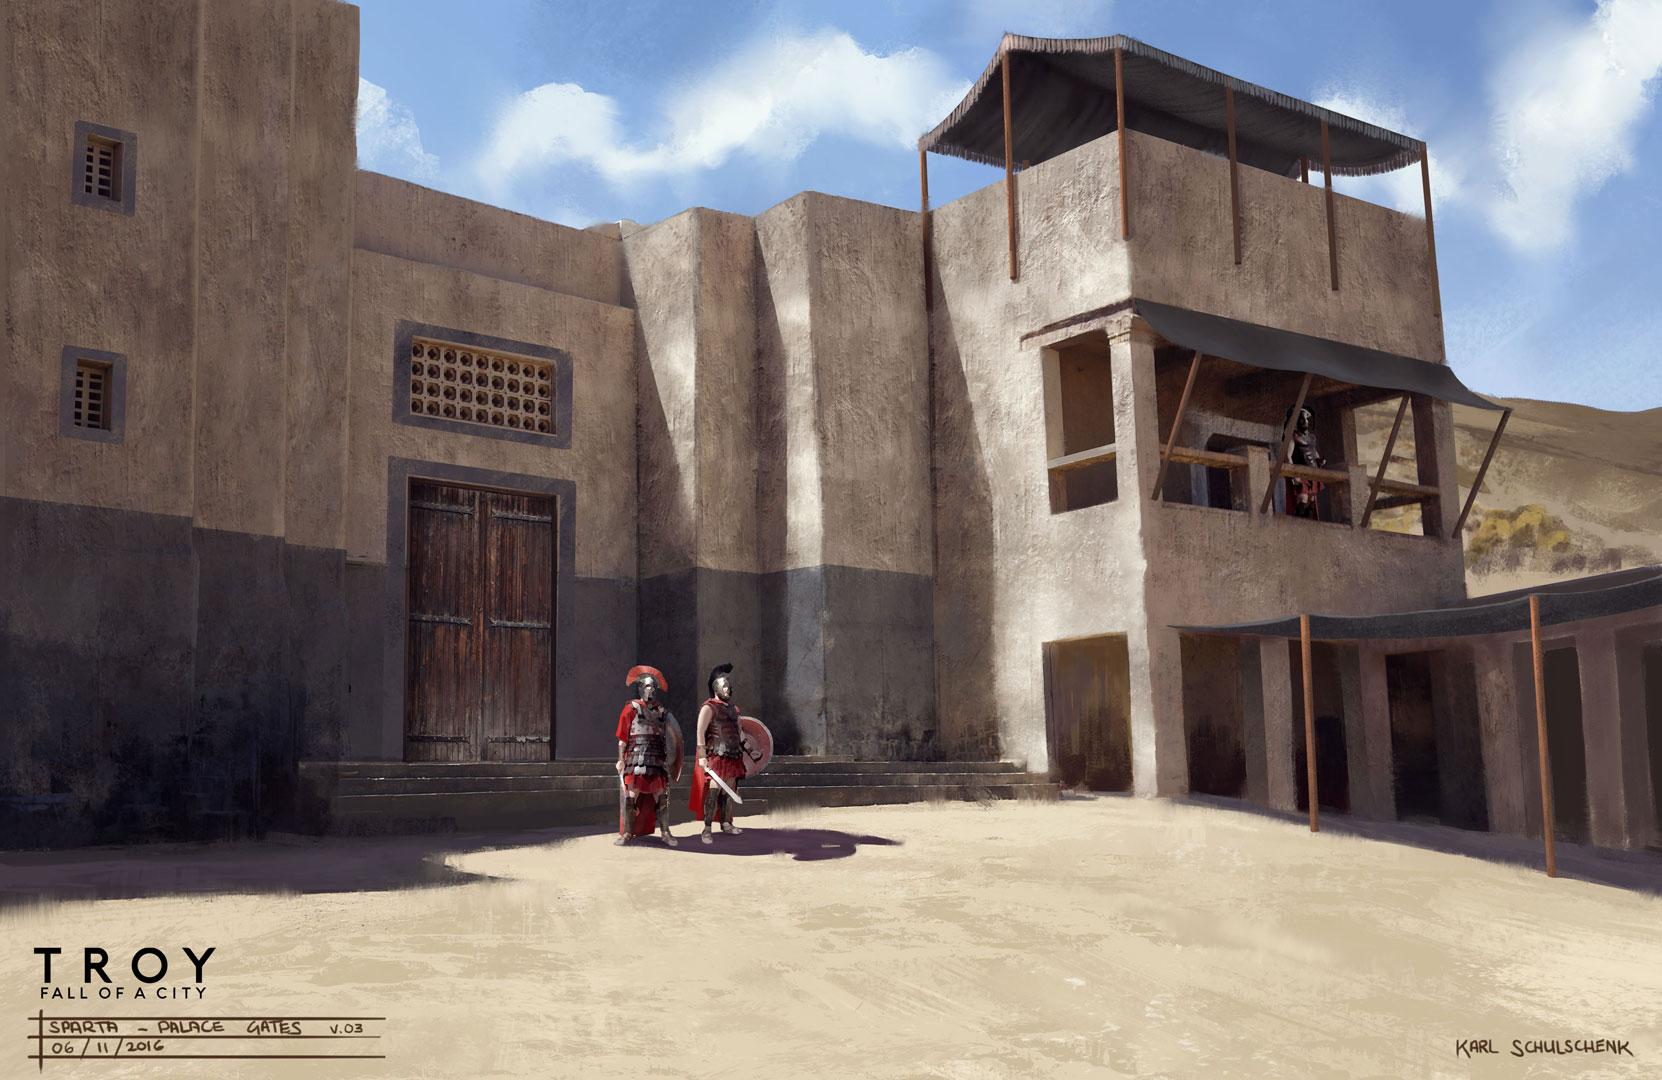 Troy---Sparta_PalaceGates_v03.jpg